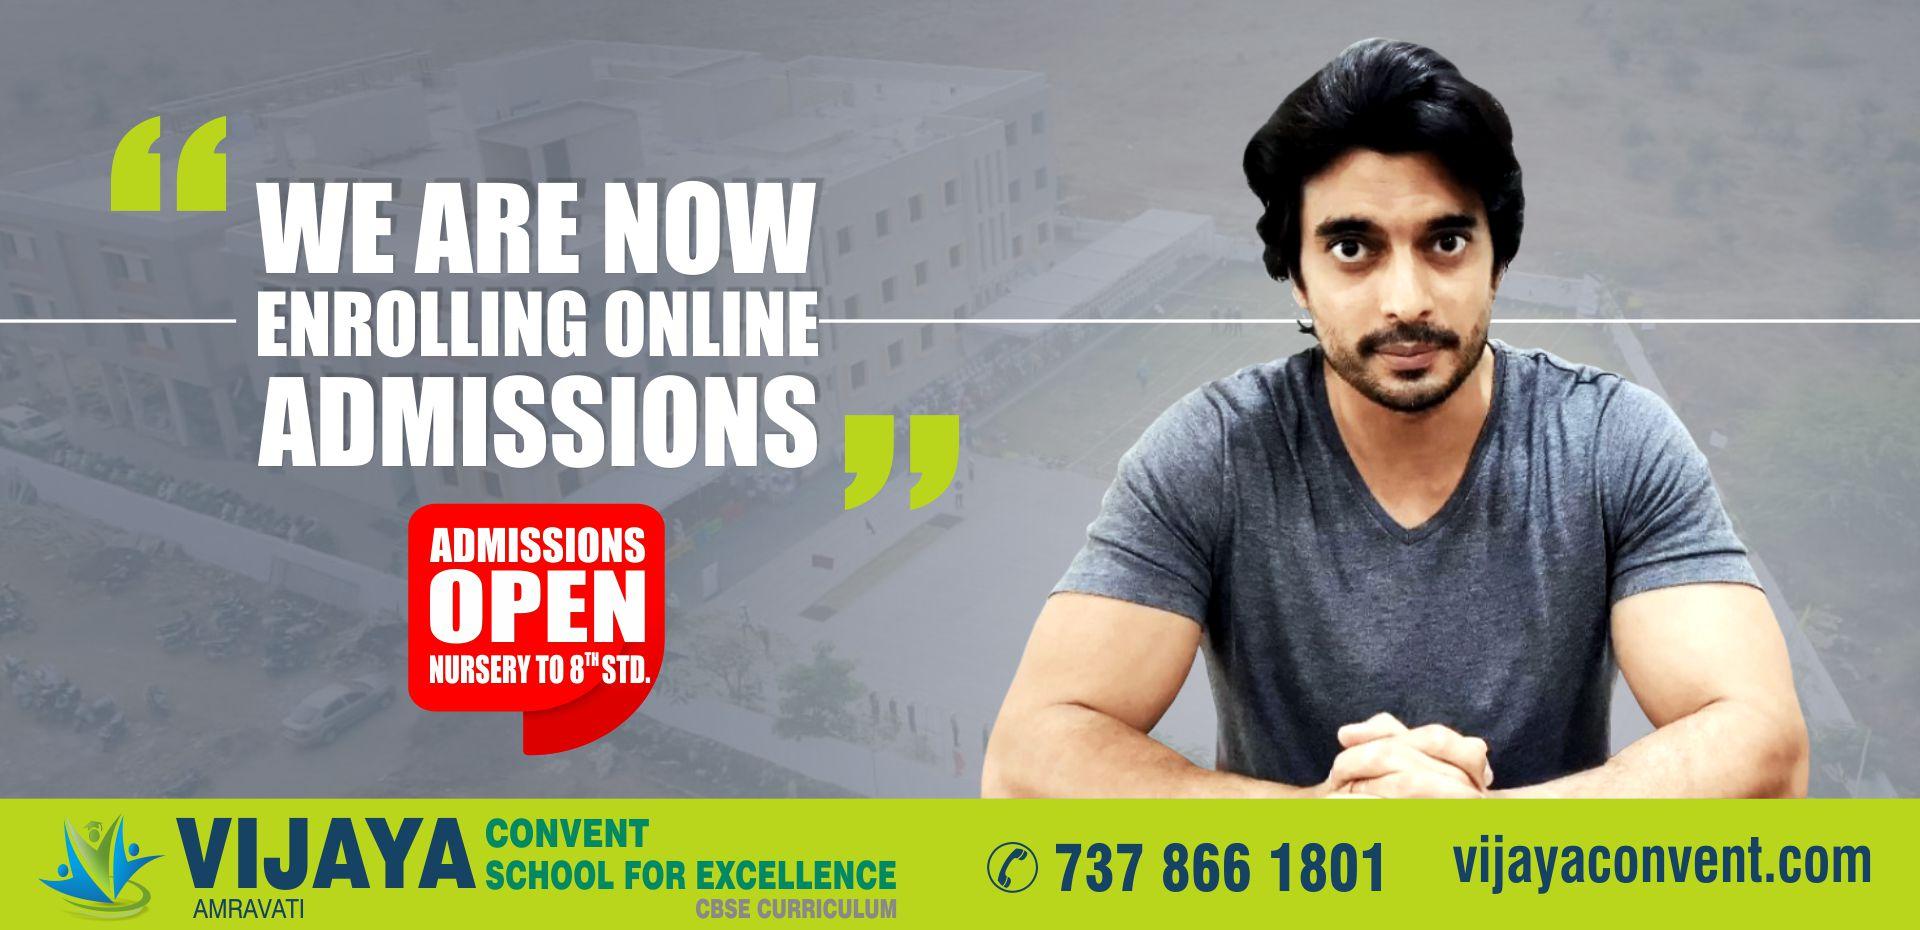 Admission Open for 20-21 at Vijaya convent school amravati cbse school